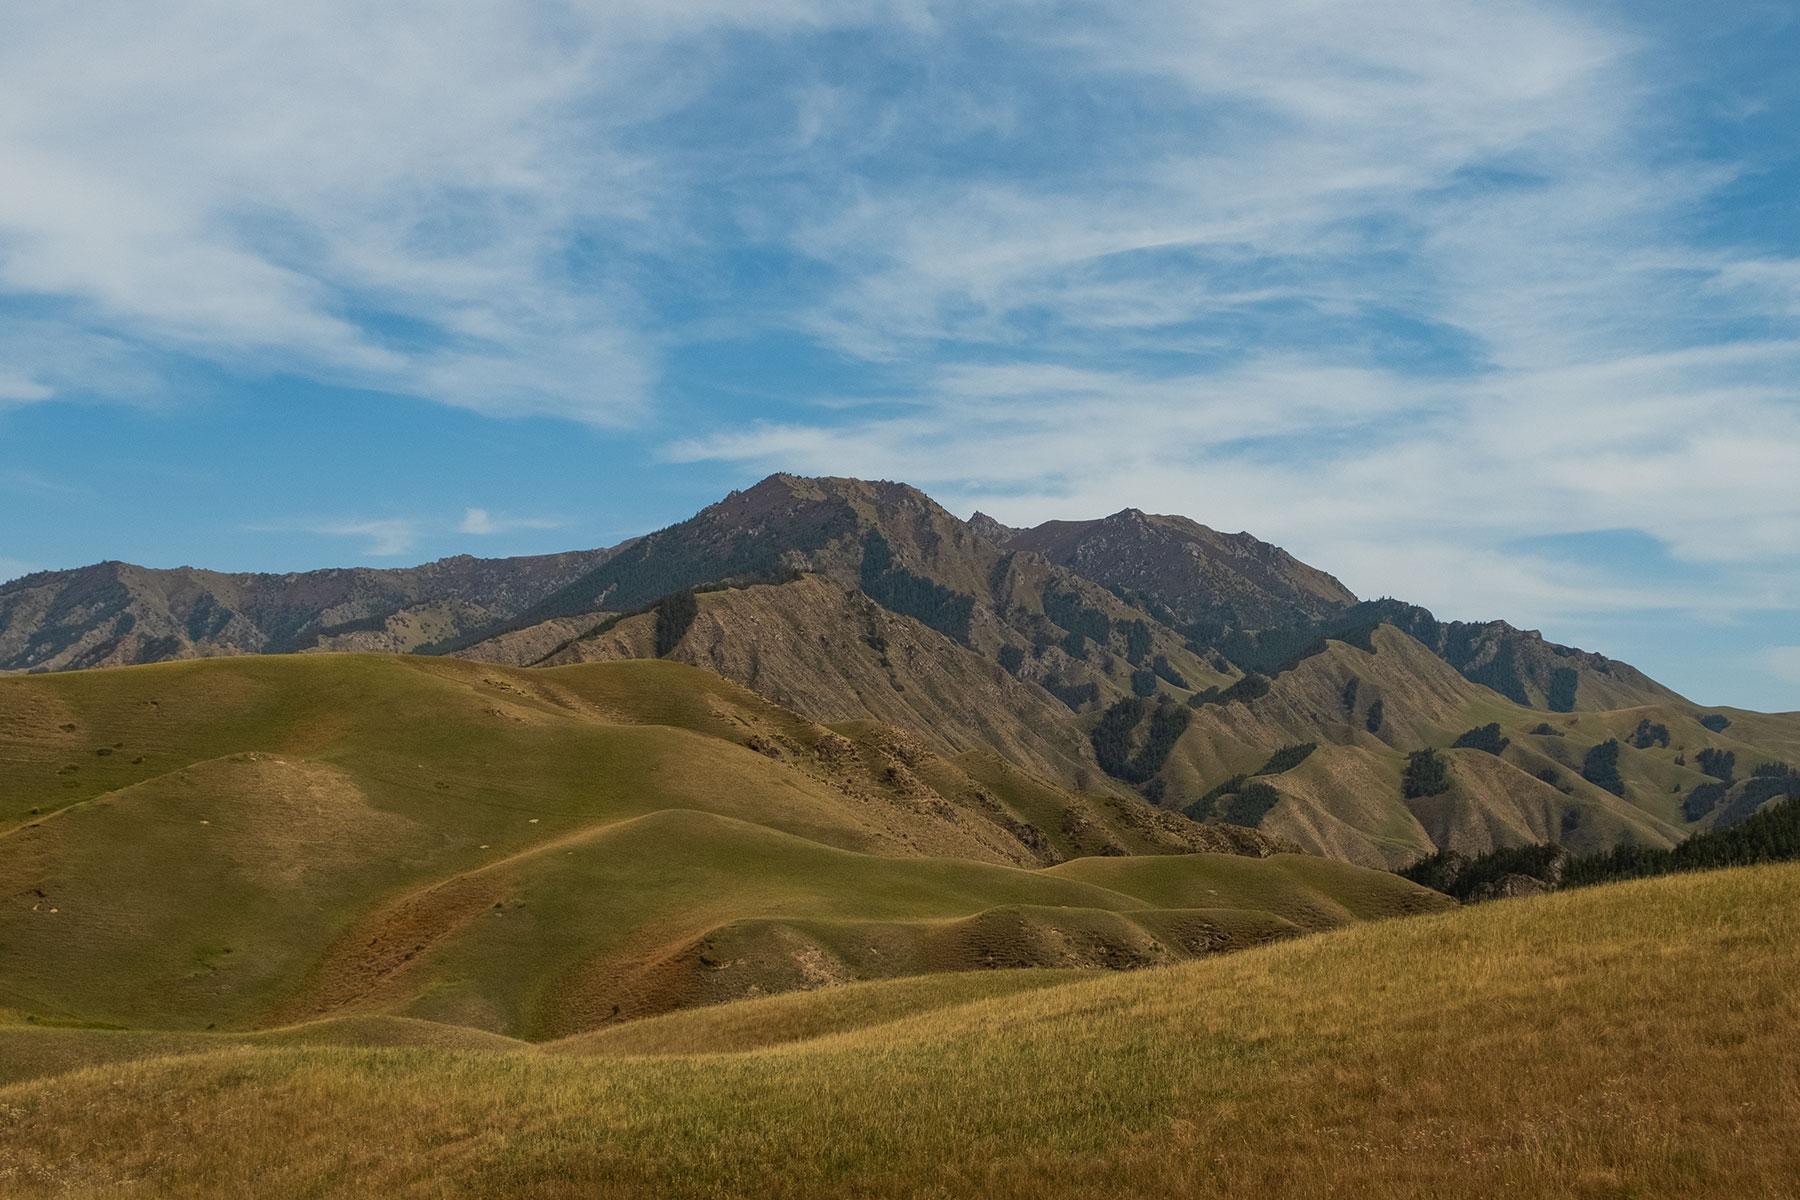 Kangle Grassland in Gansu in China